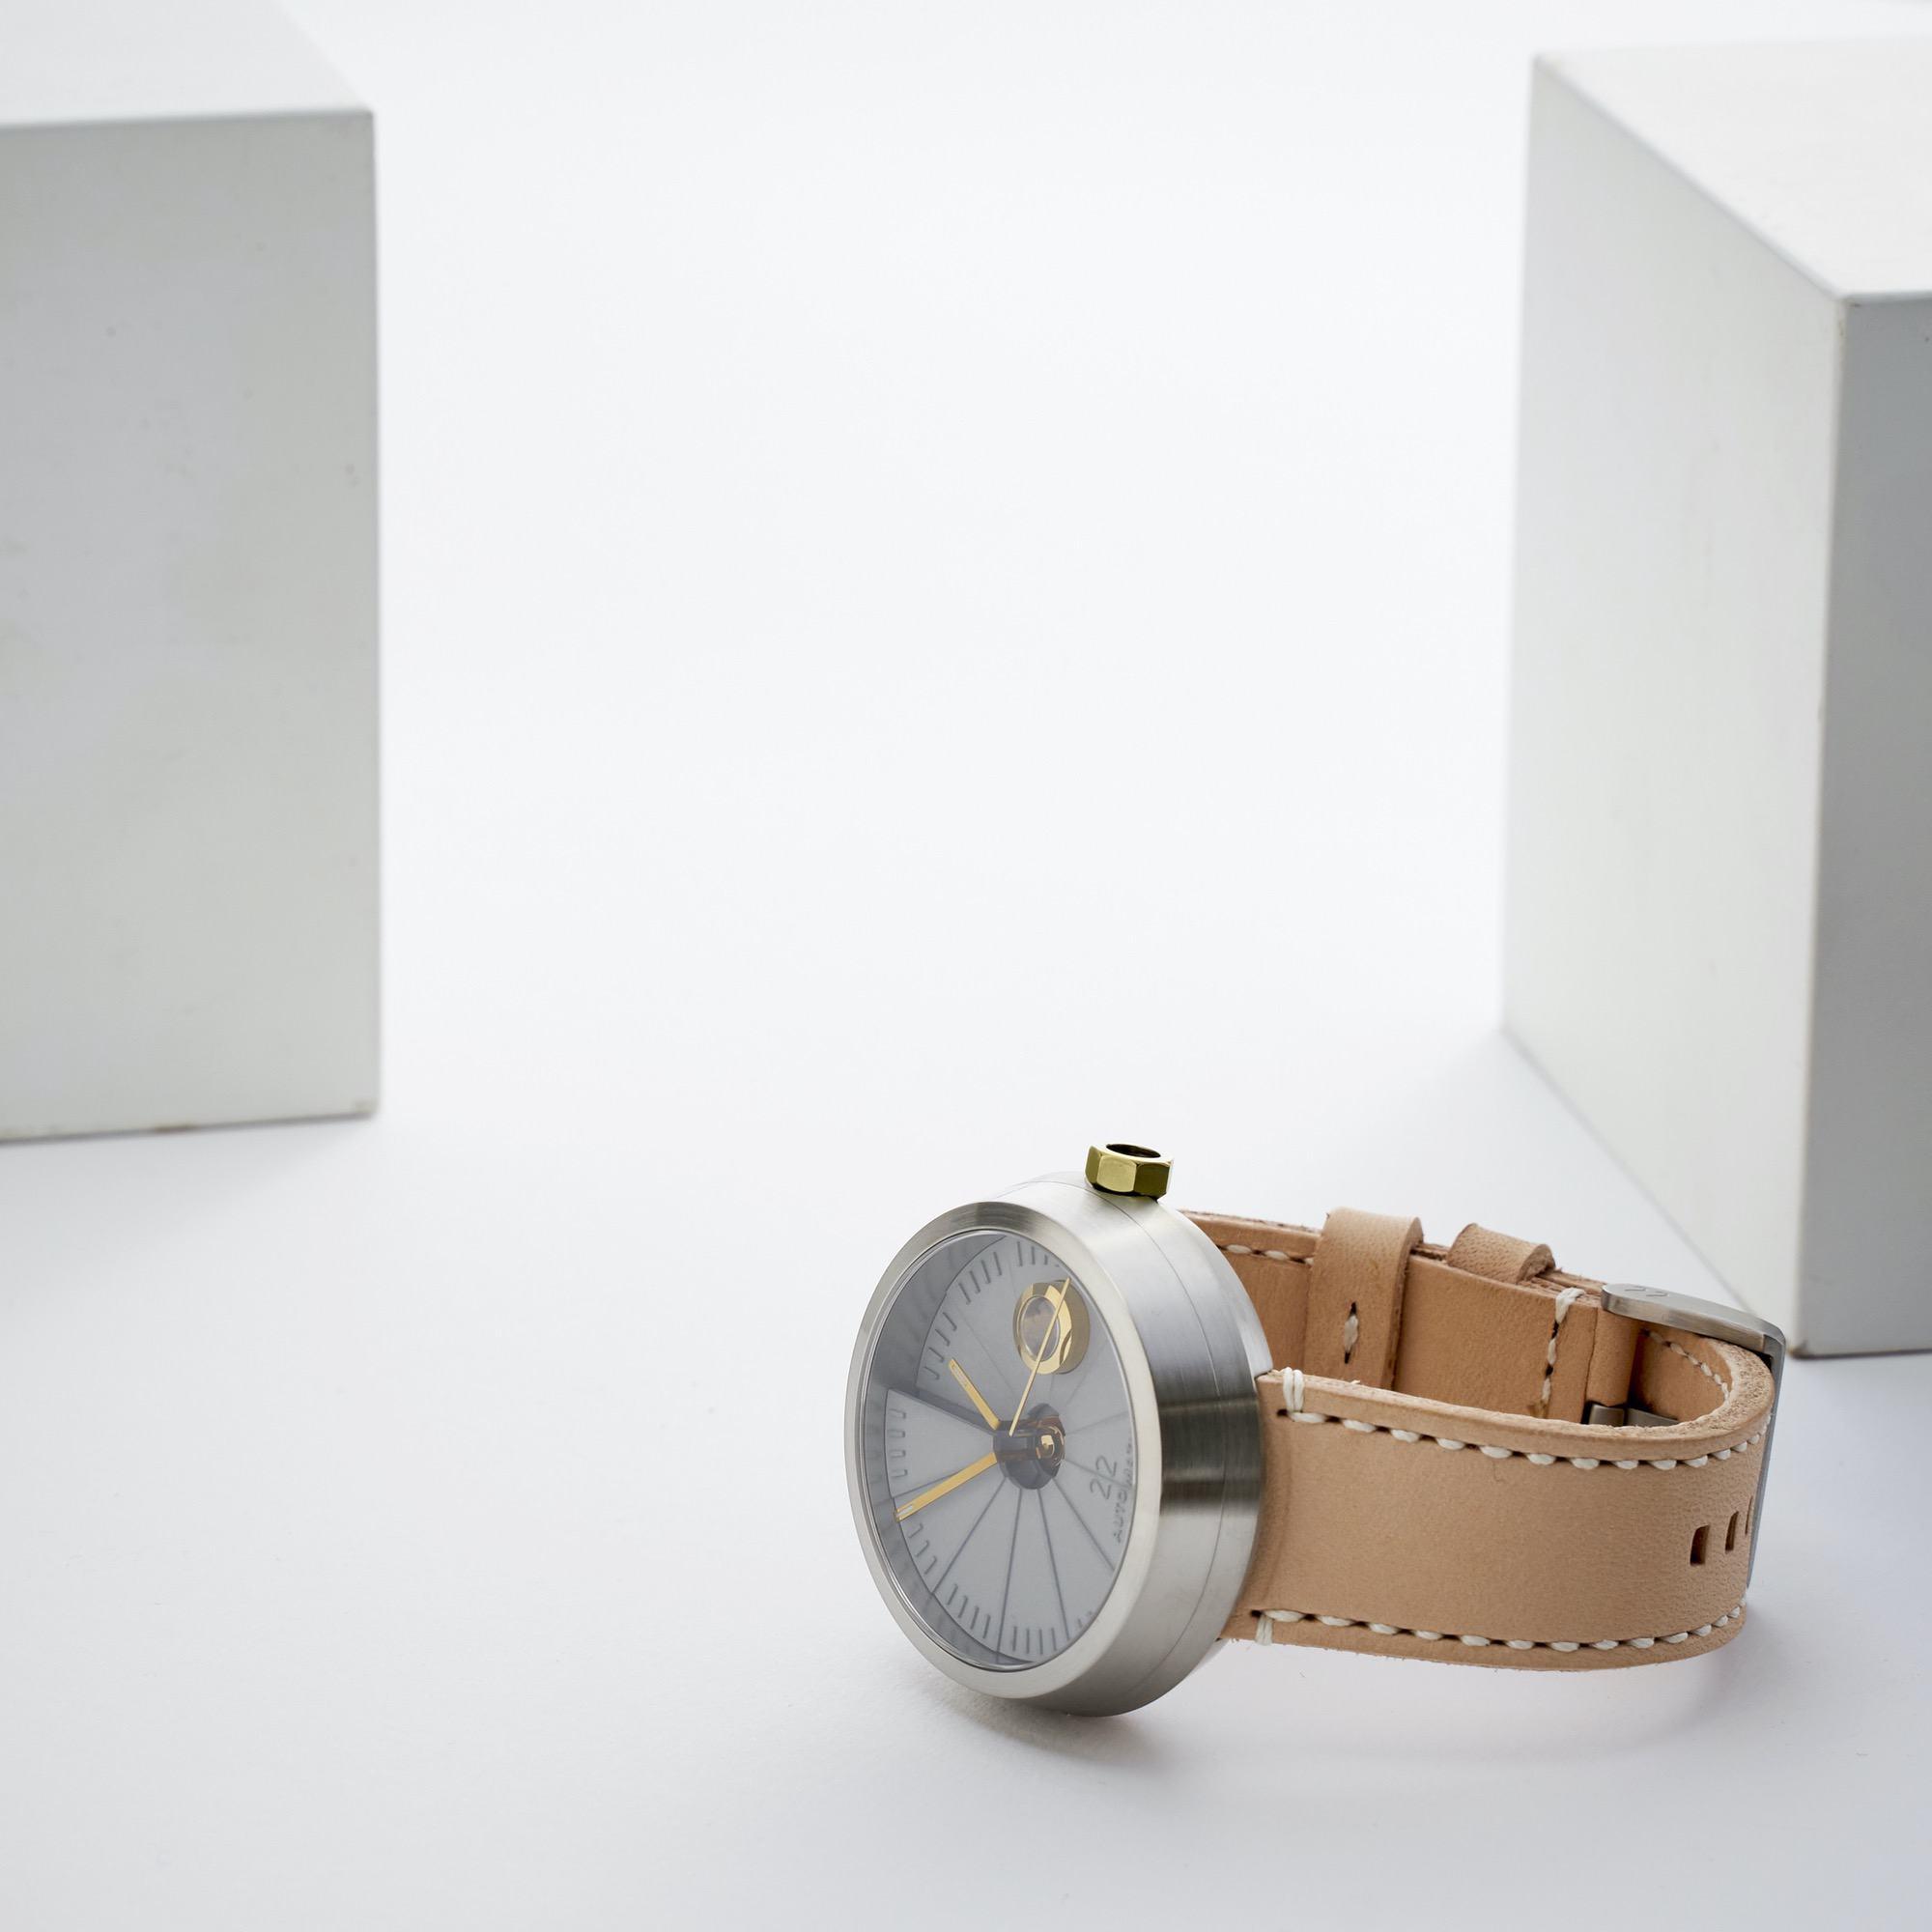 22 Studio Часы 4D Watch Automatic Original